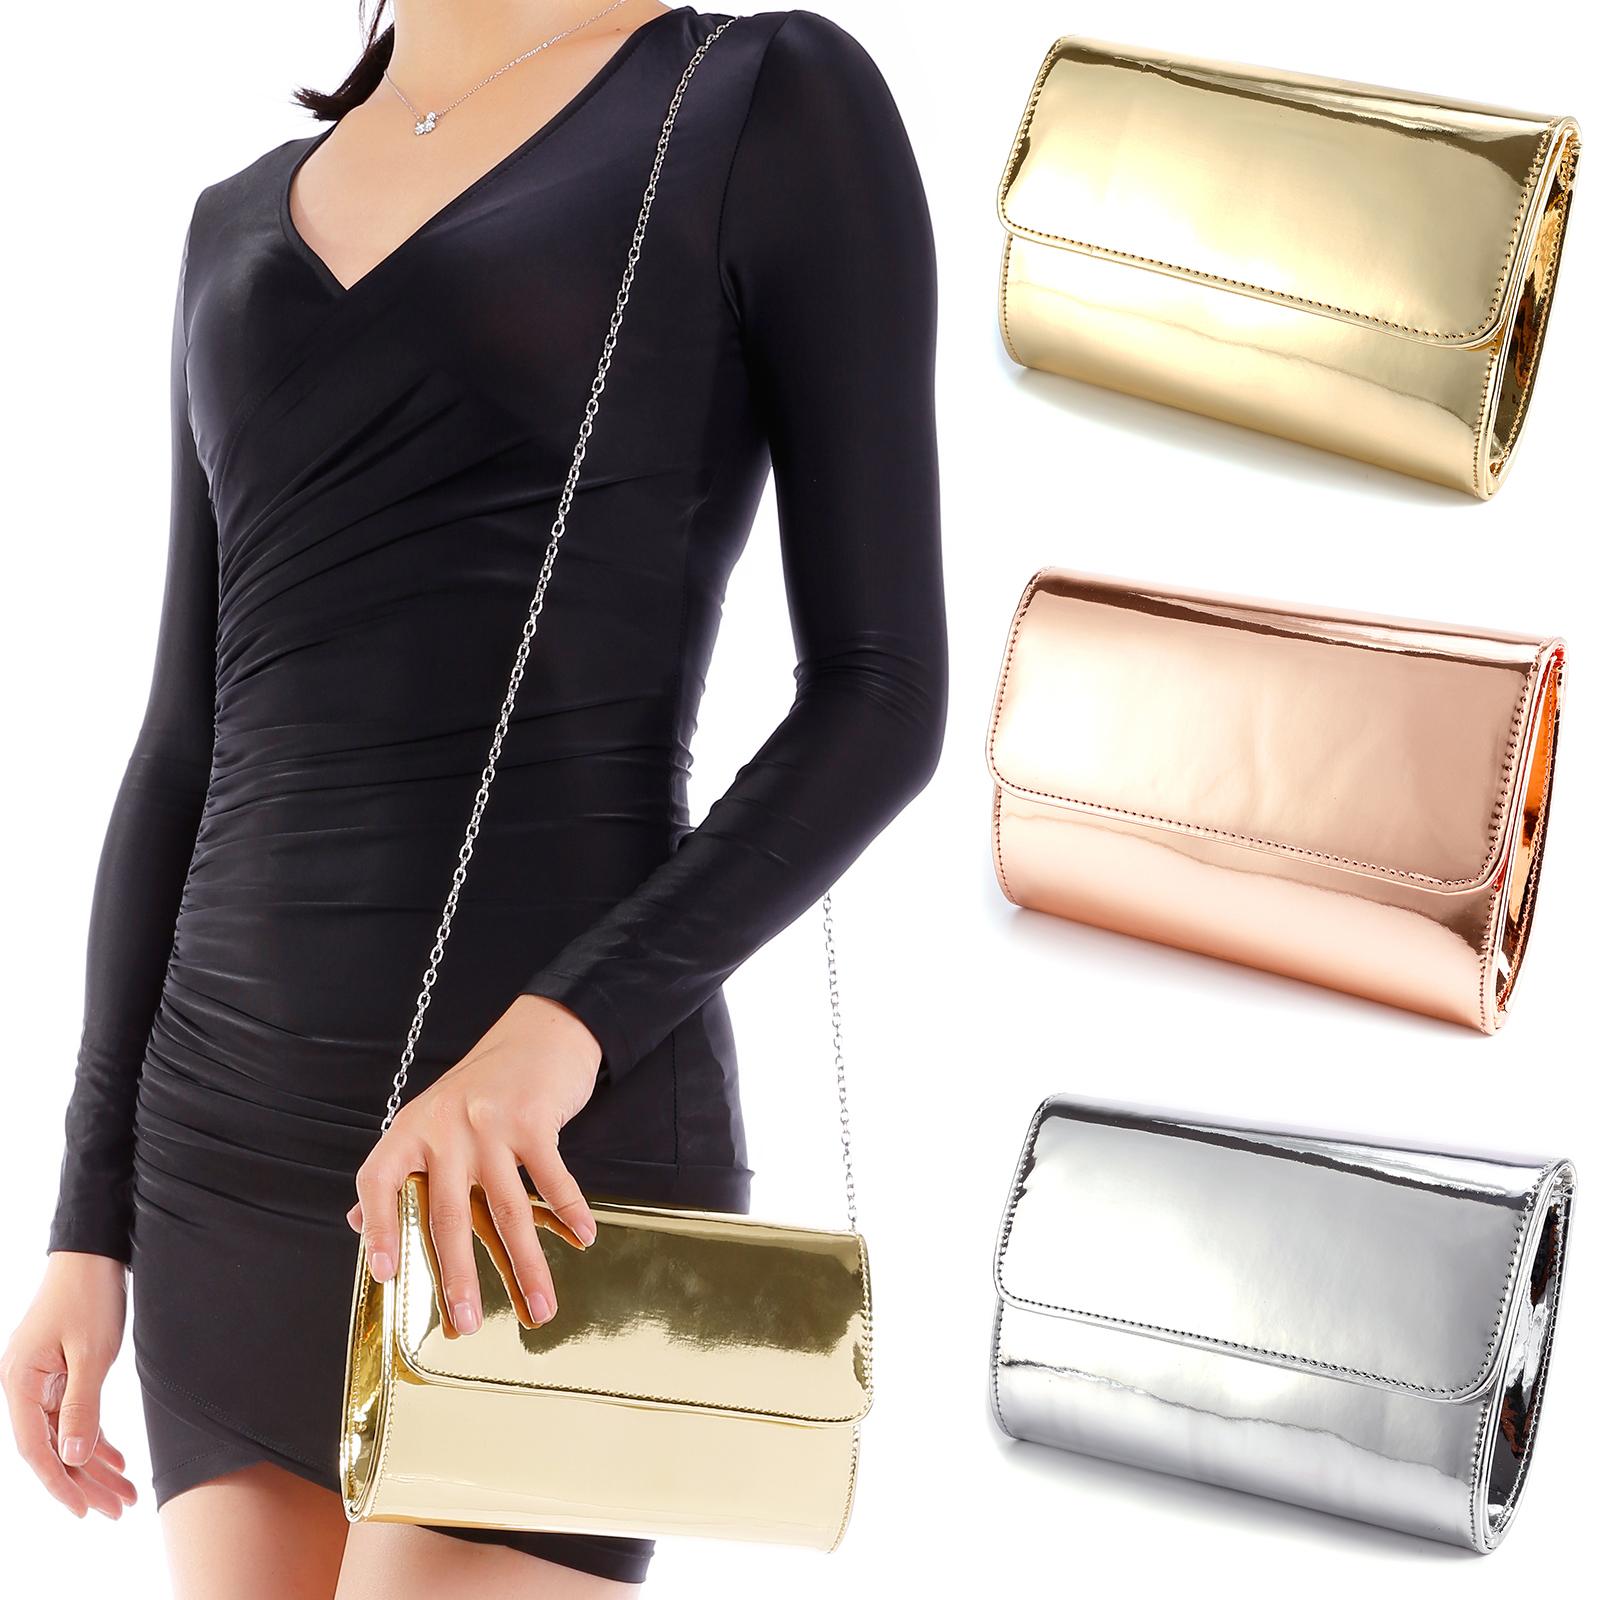 Ladies Glitter Box Hard Case Clutch Wedding Bride Evening Party Prom Night bag